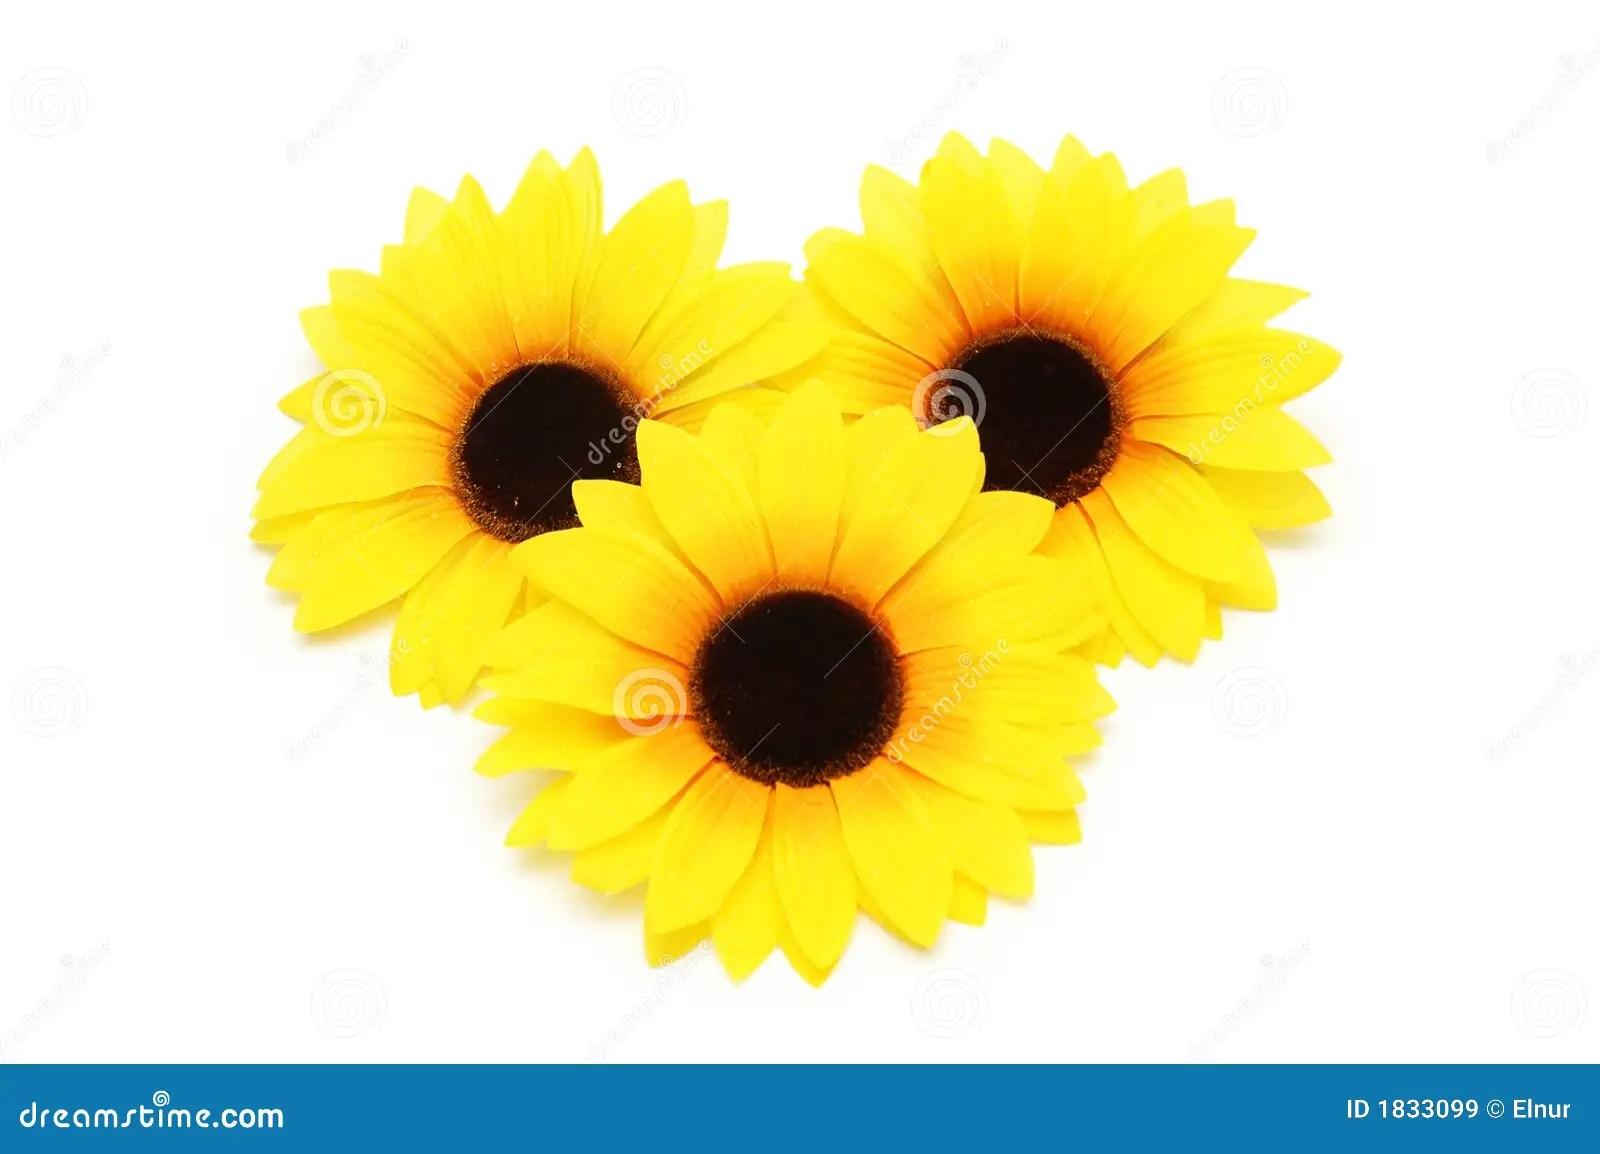 Black Daisy Wallpaper Three Sunflowers Isolated Stock Image Image Of Love Life